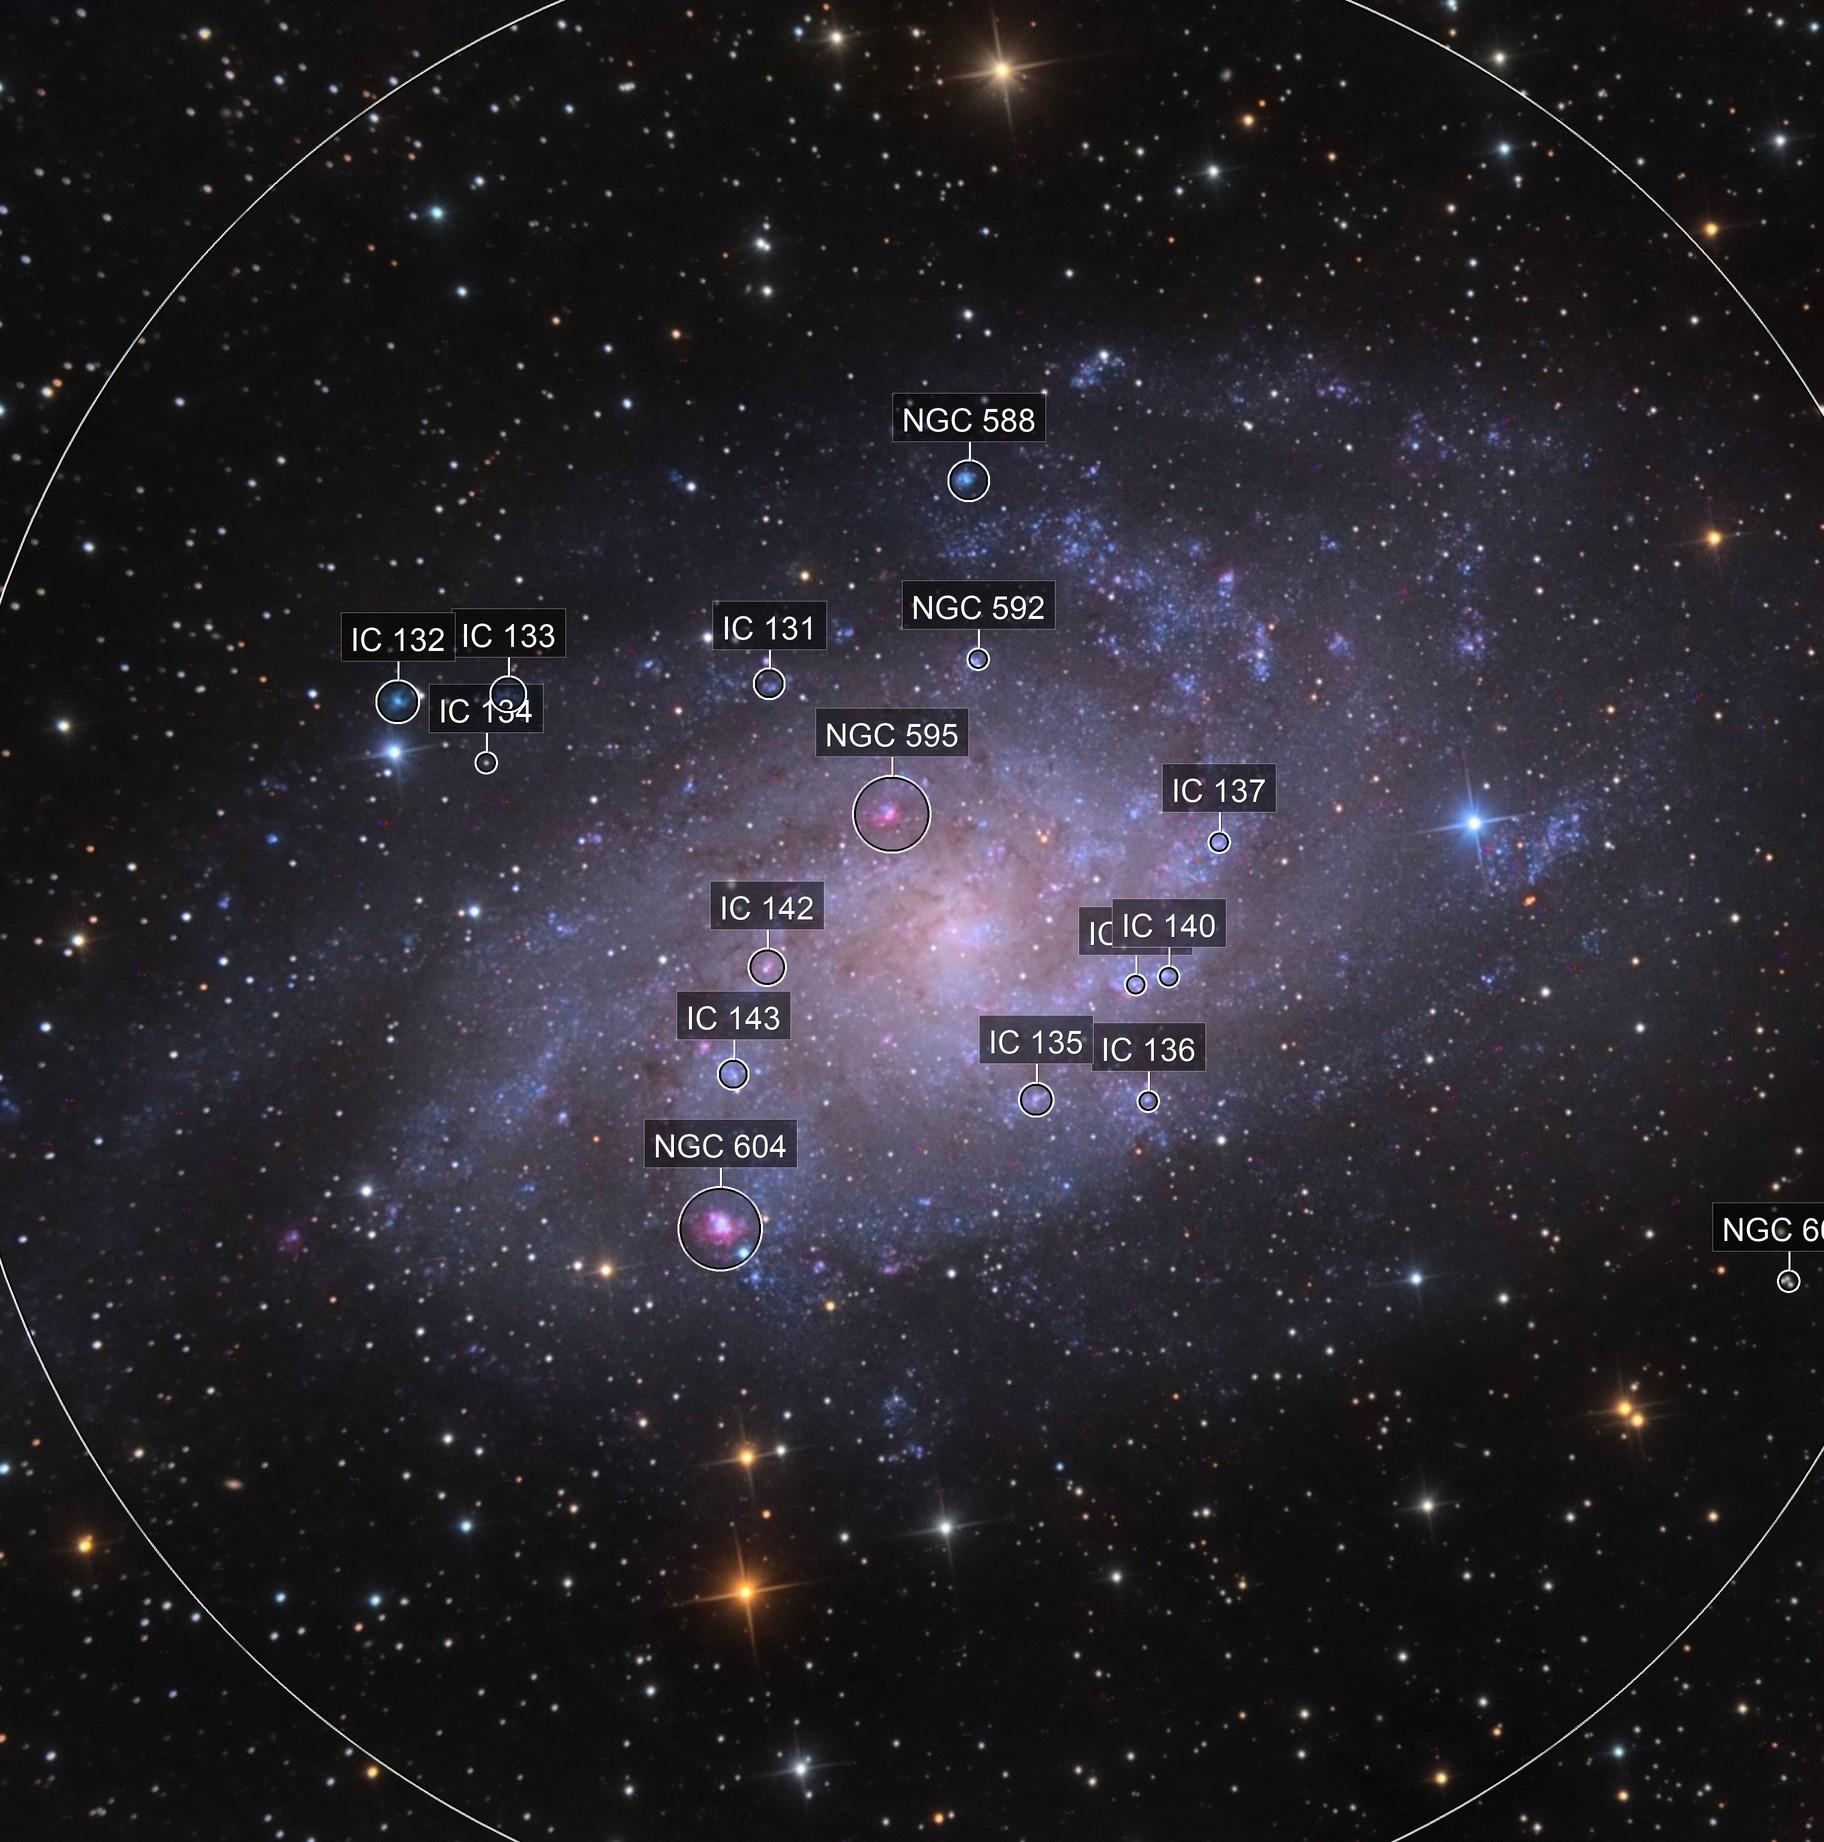 M 33 - The Triangulum Galaxy